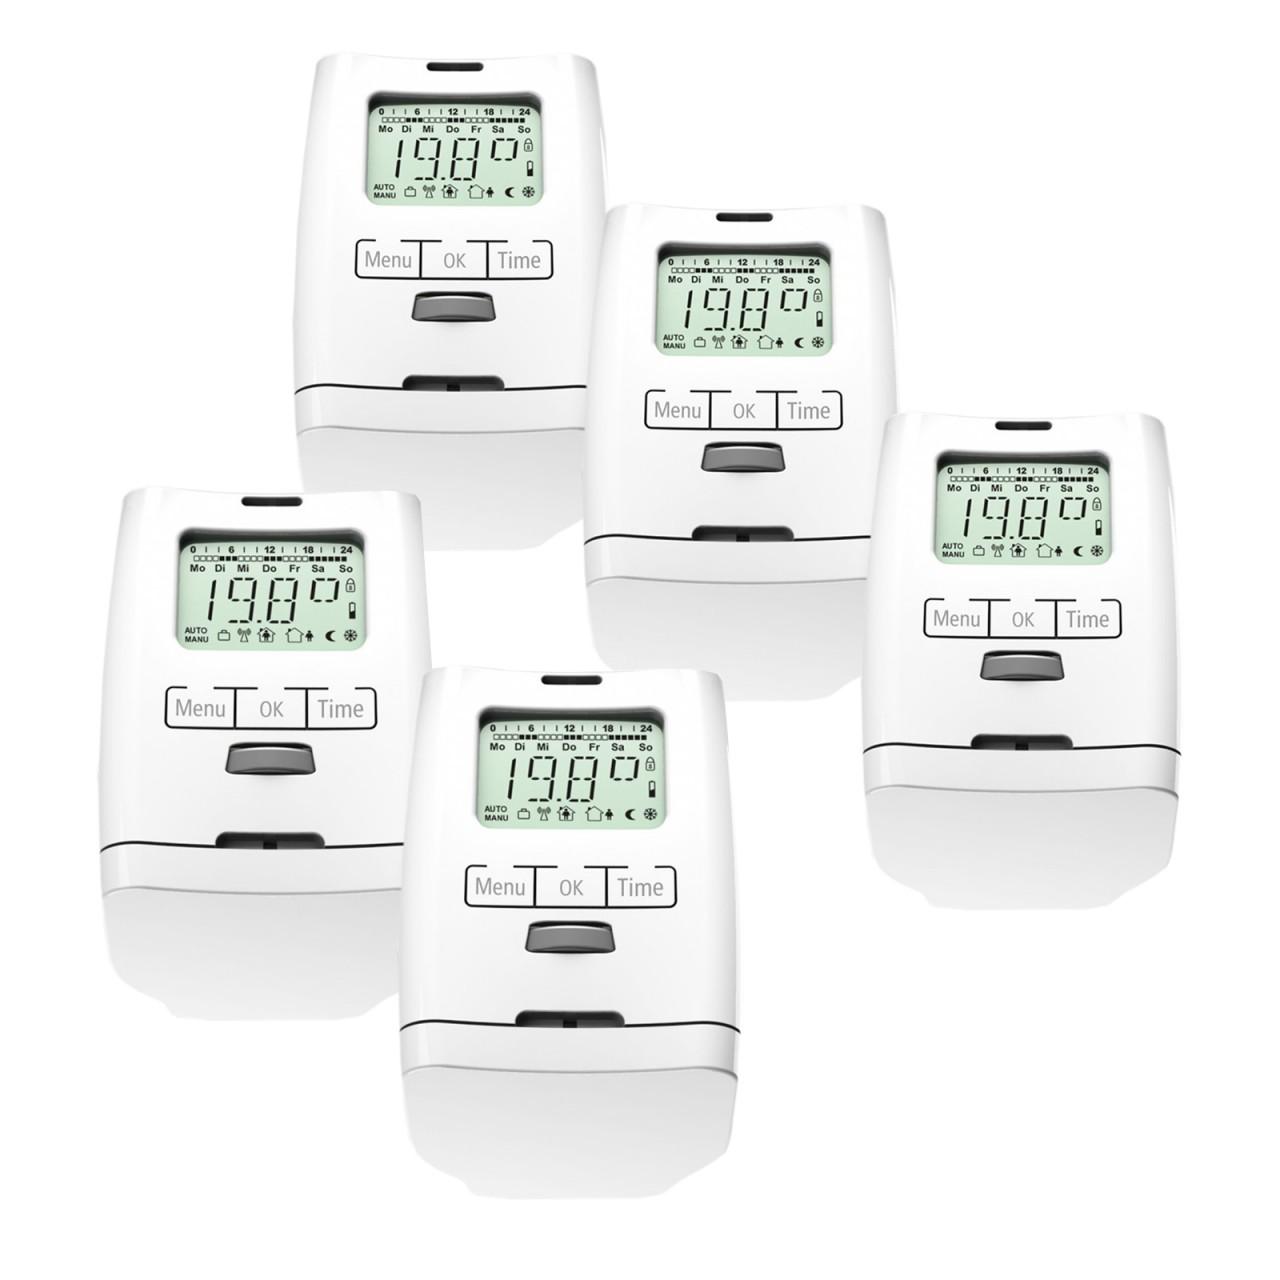 5 Stück HT 2000 Elektronischer Heizkörperthermostat Made in Germany